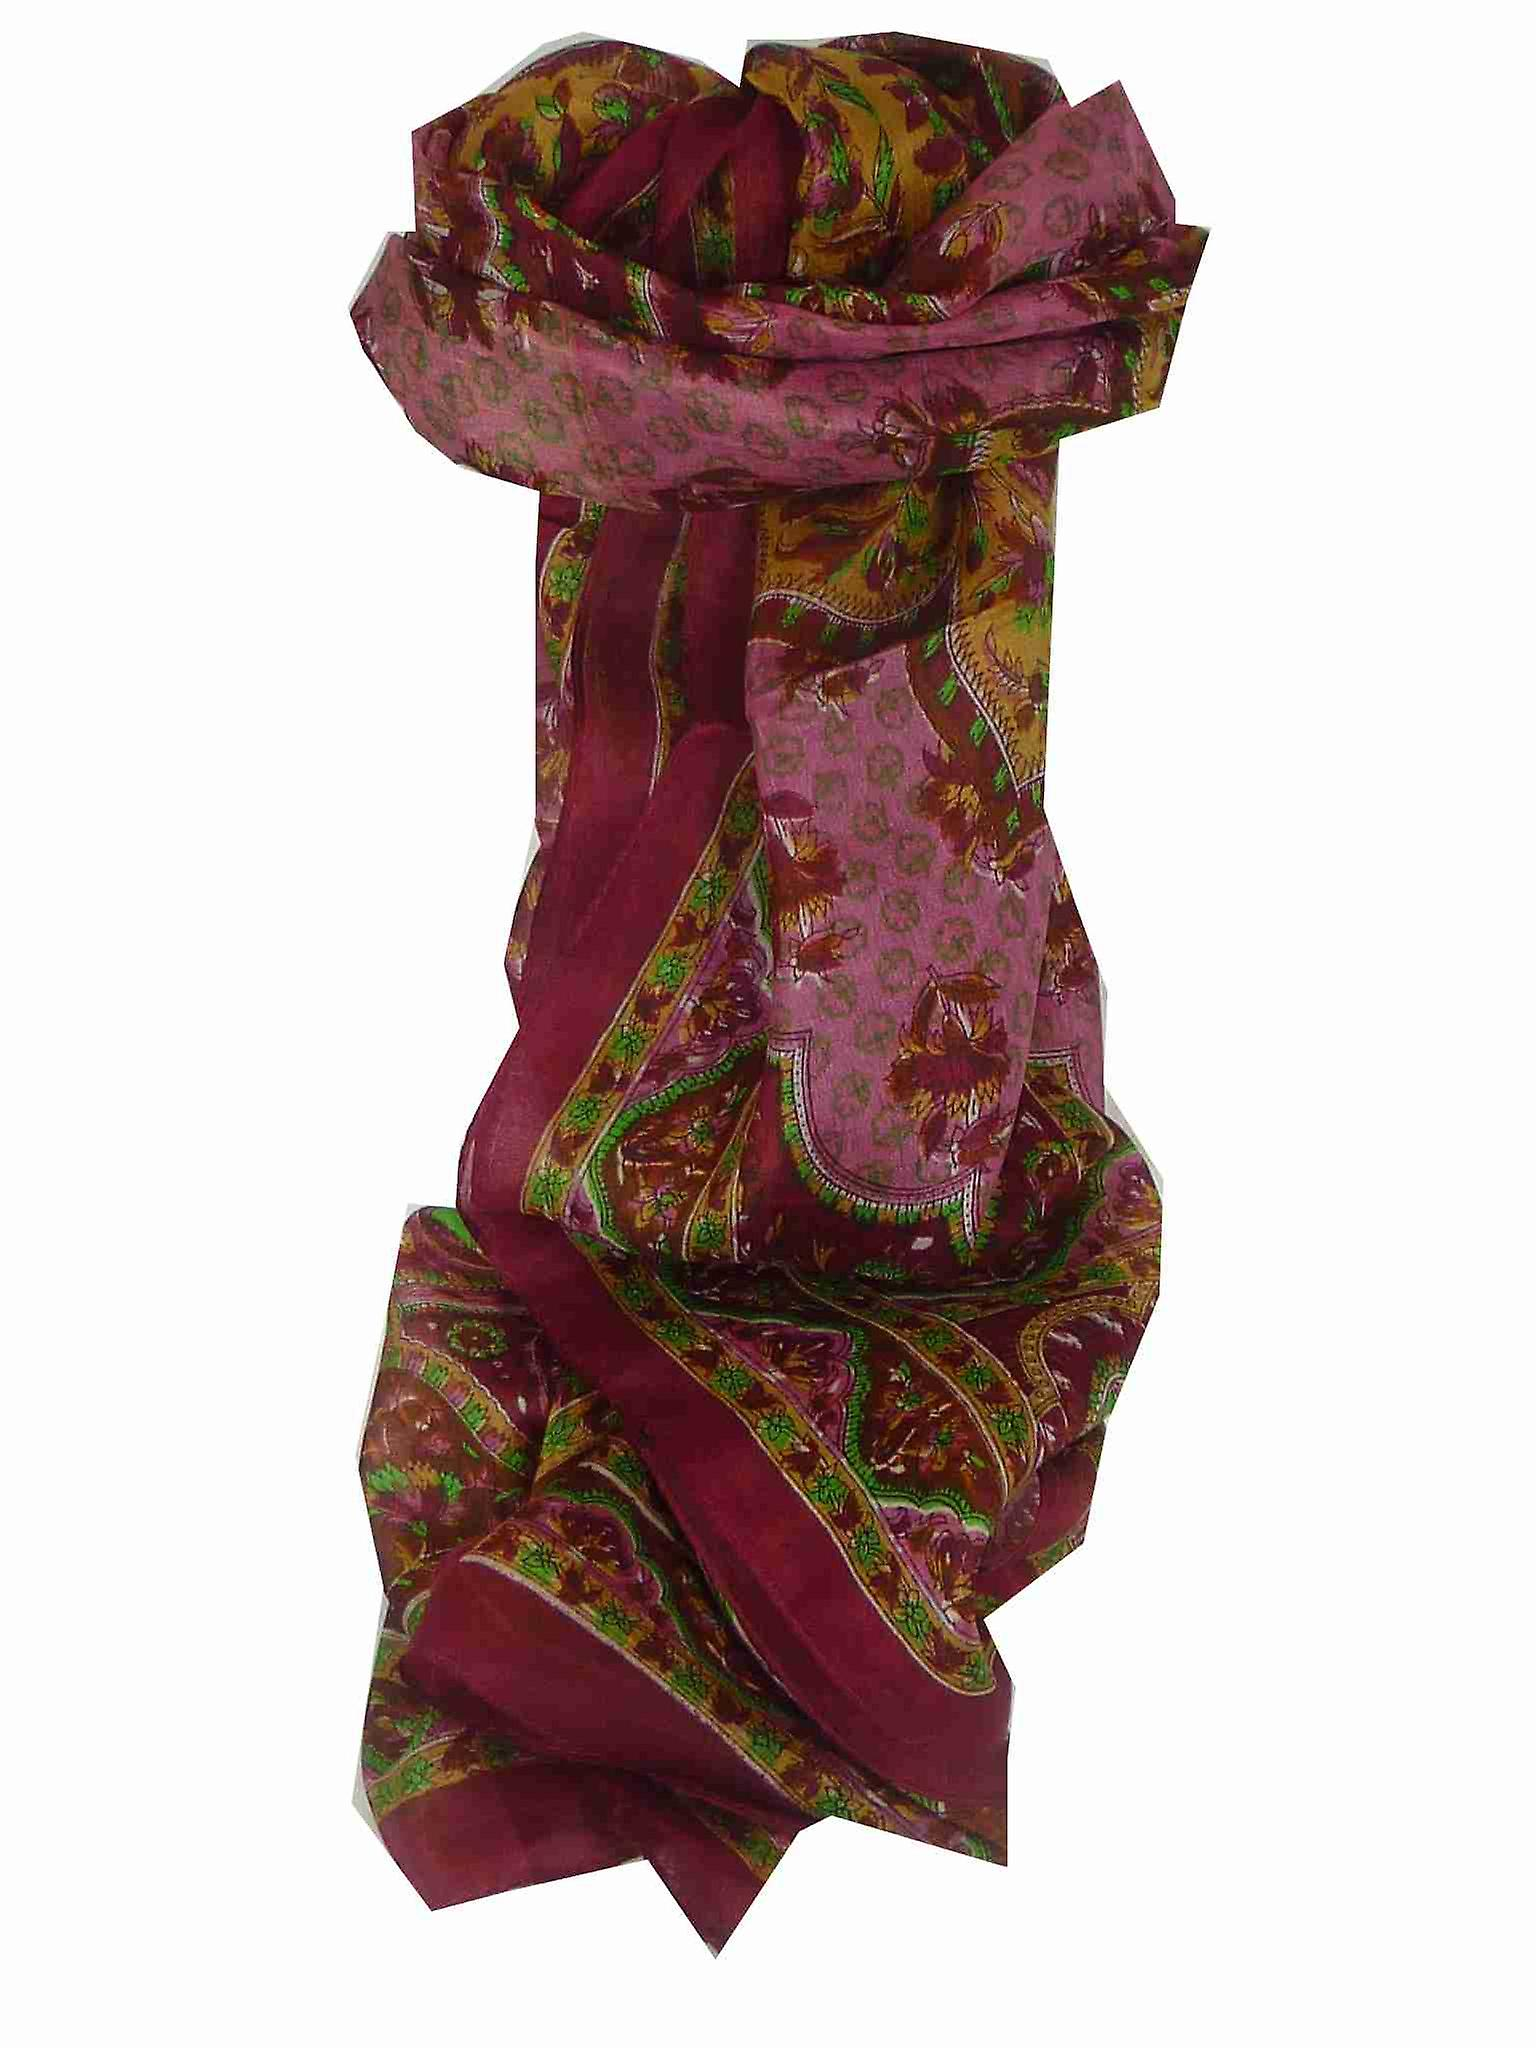 Mulberry Silk Traditional Long Scarf Suru Burgundy by Pashmina & Silk